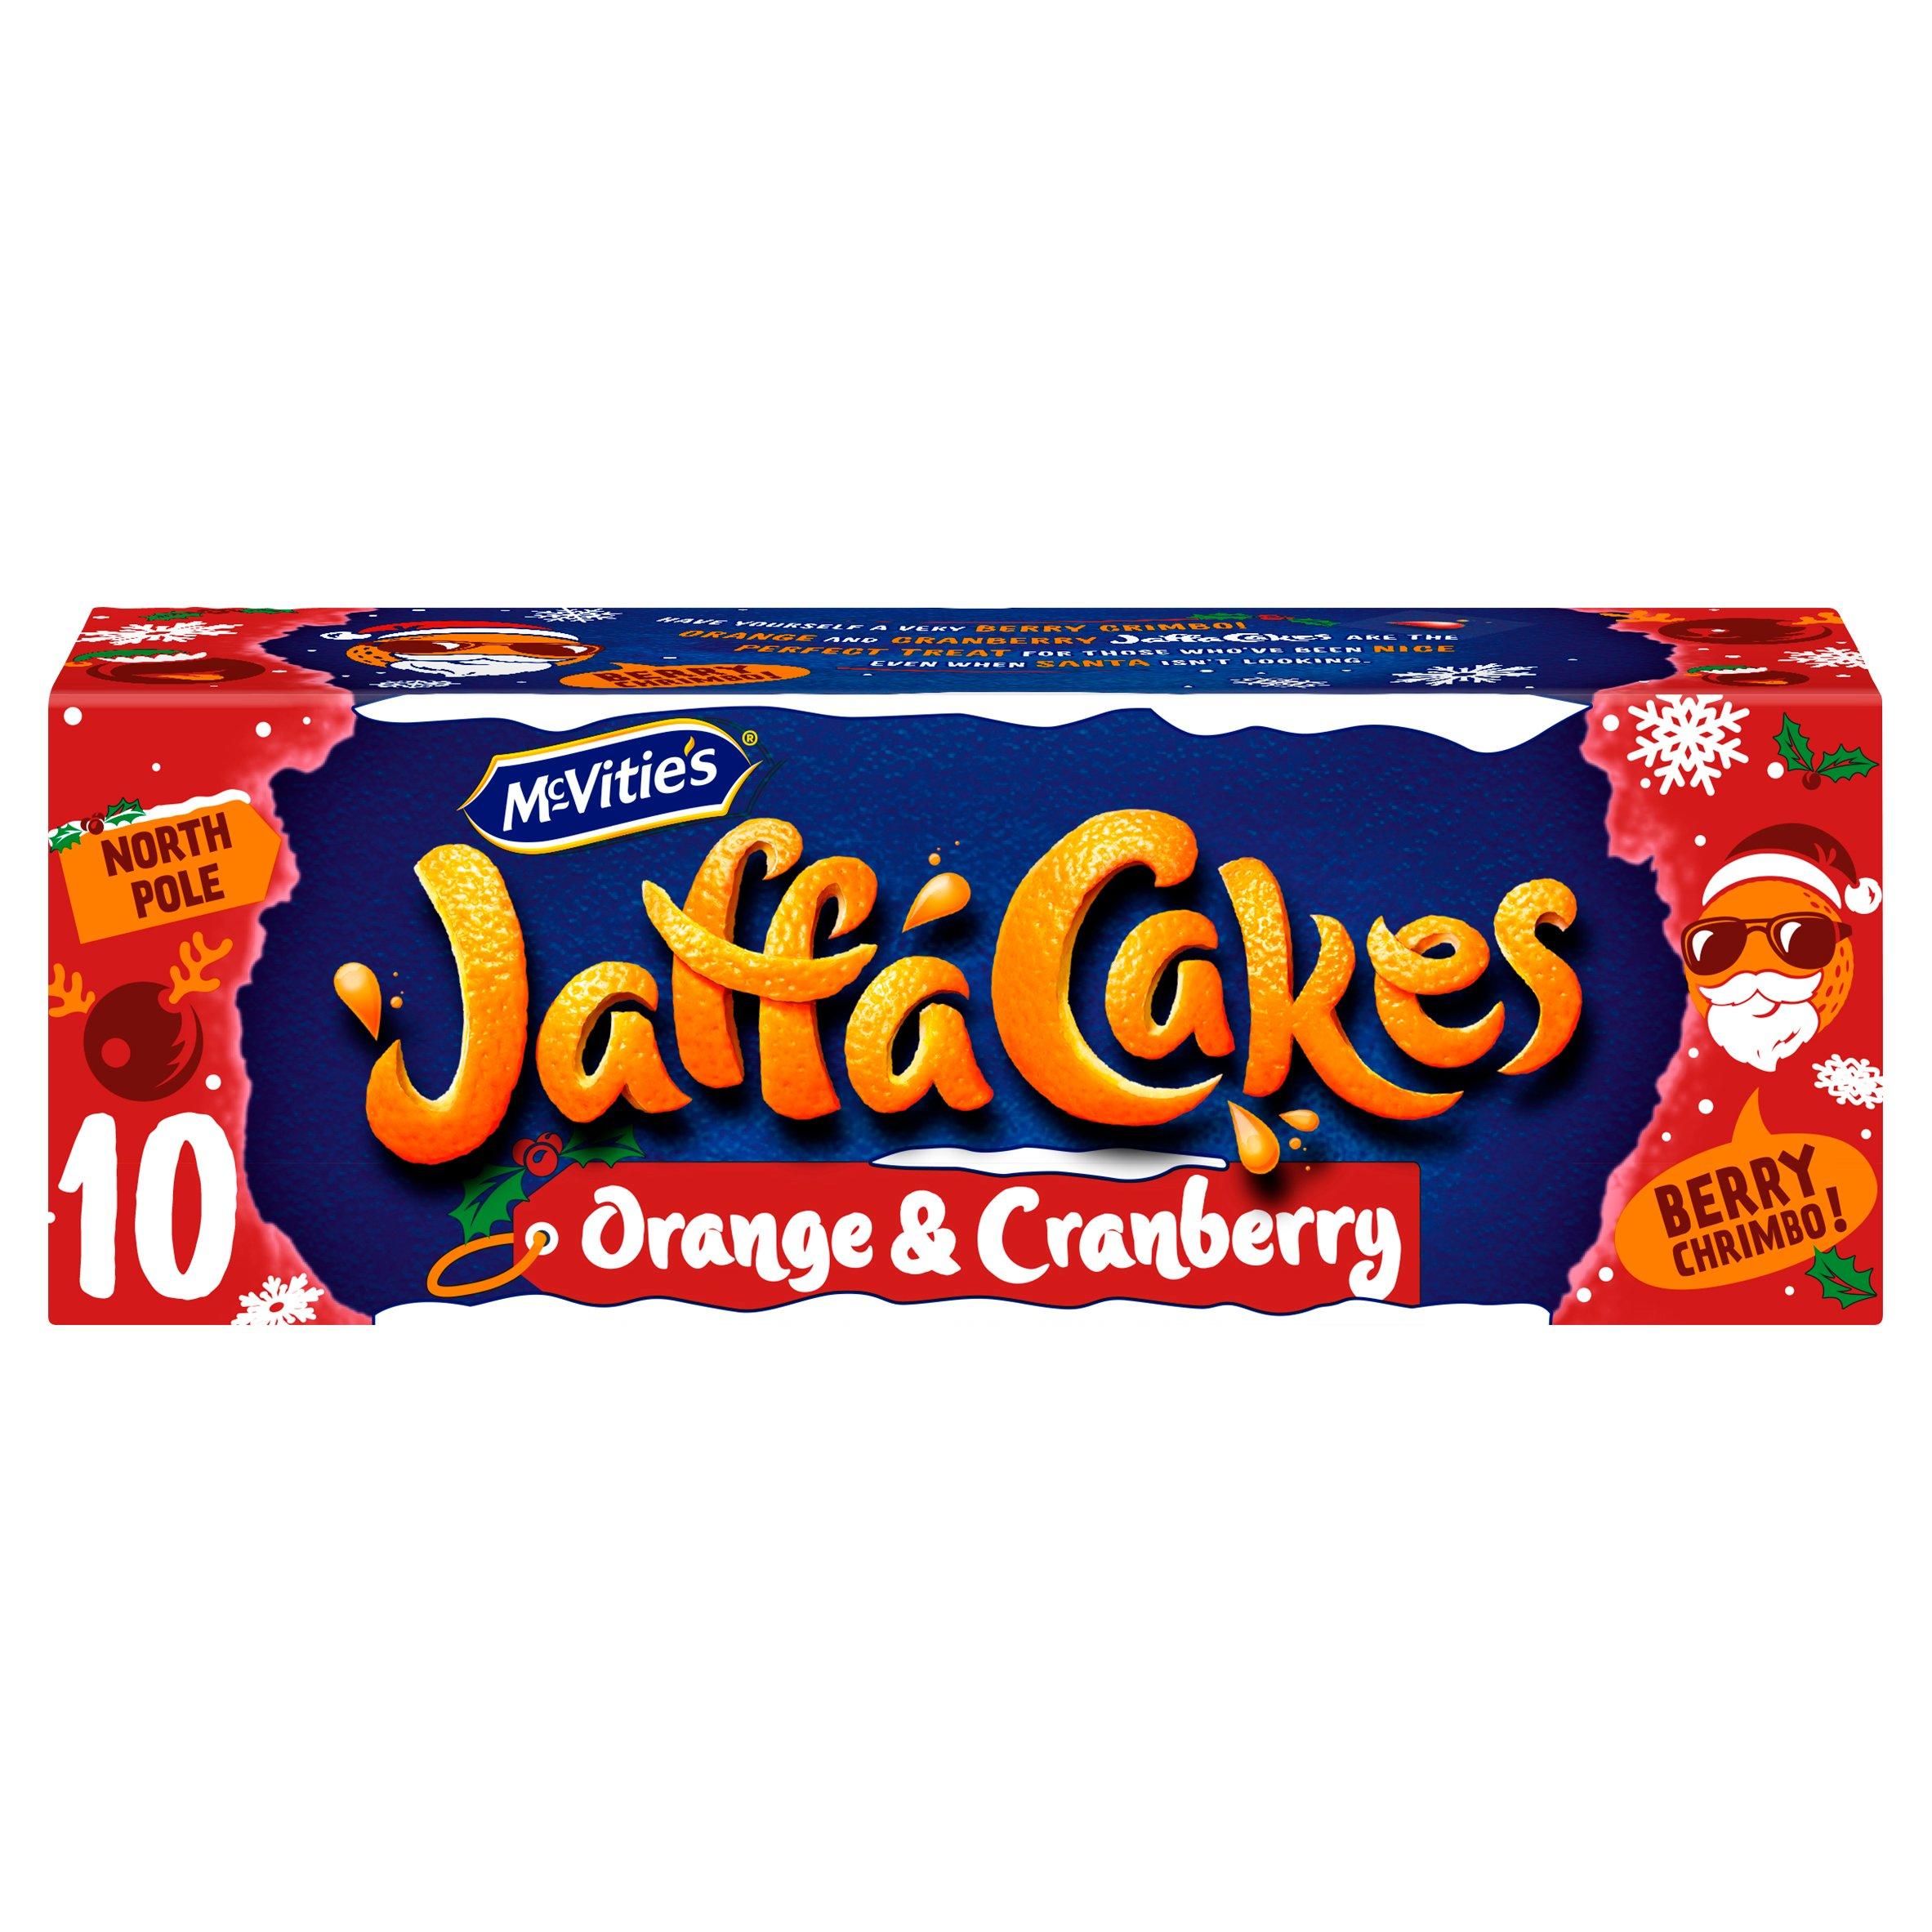 Mcvities Jaffa Cakes Orange & Cranberry Flavour 10 Pack